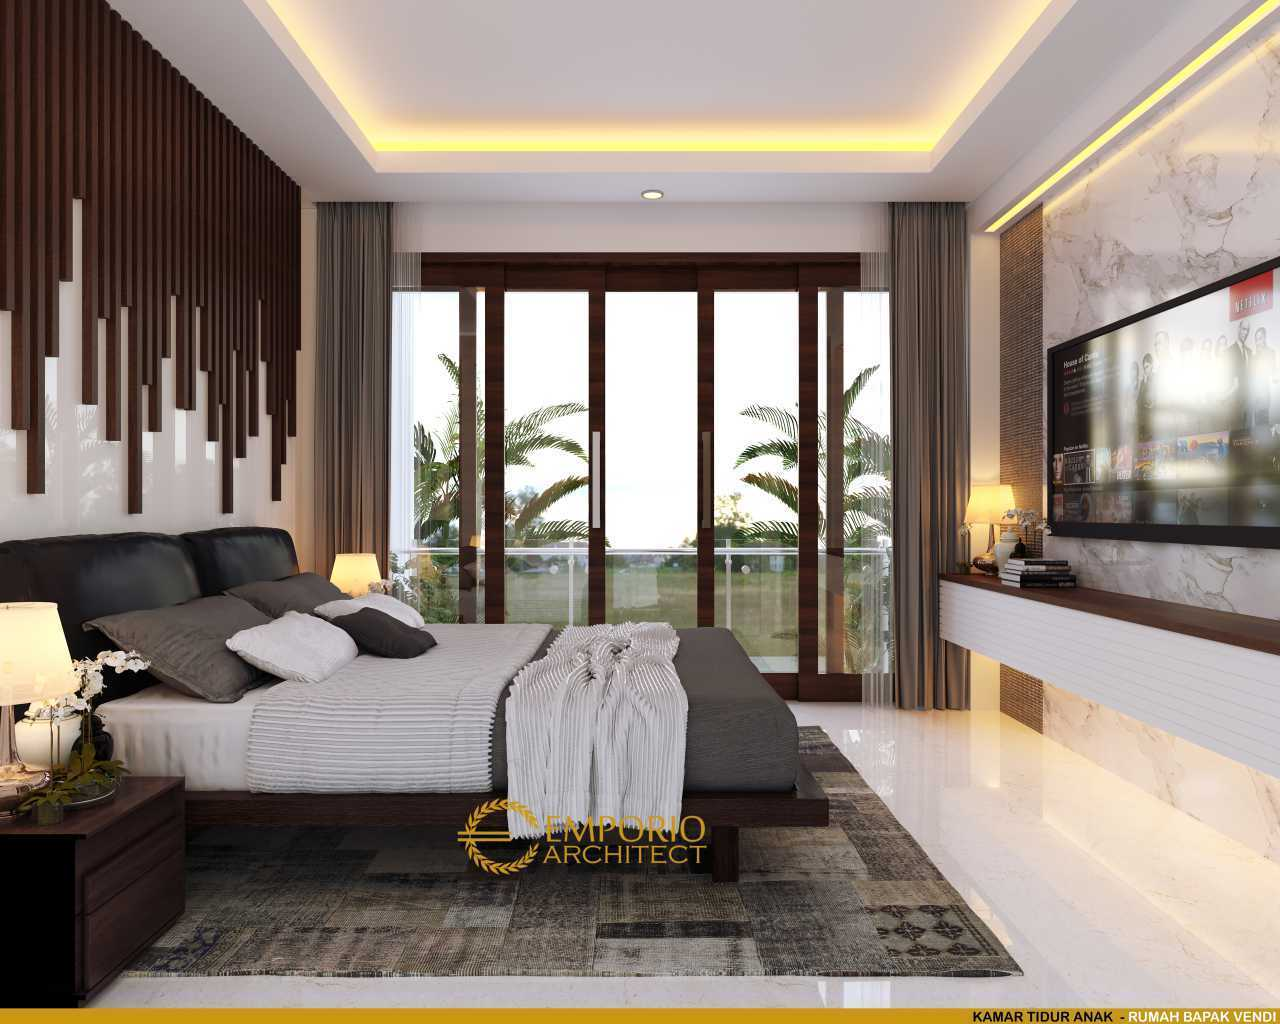 Emporio Architect Jasa Arsitek Badung Desain Rumah Modern 2 Lantai 726 @ Petitenget, Badung, Bali Kabupaten Badung, Bali, Indonesia Kabupaten Badung, Bali, Indonesia Emporio-Architect-Jasa-Arsitek-Badung-Desain-Rumah-Modern-2-Lantai-726-Petitenget-Badung-Bali  93953